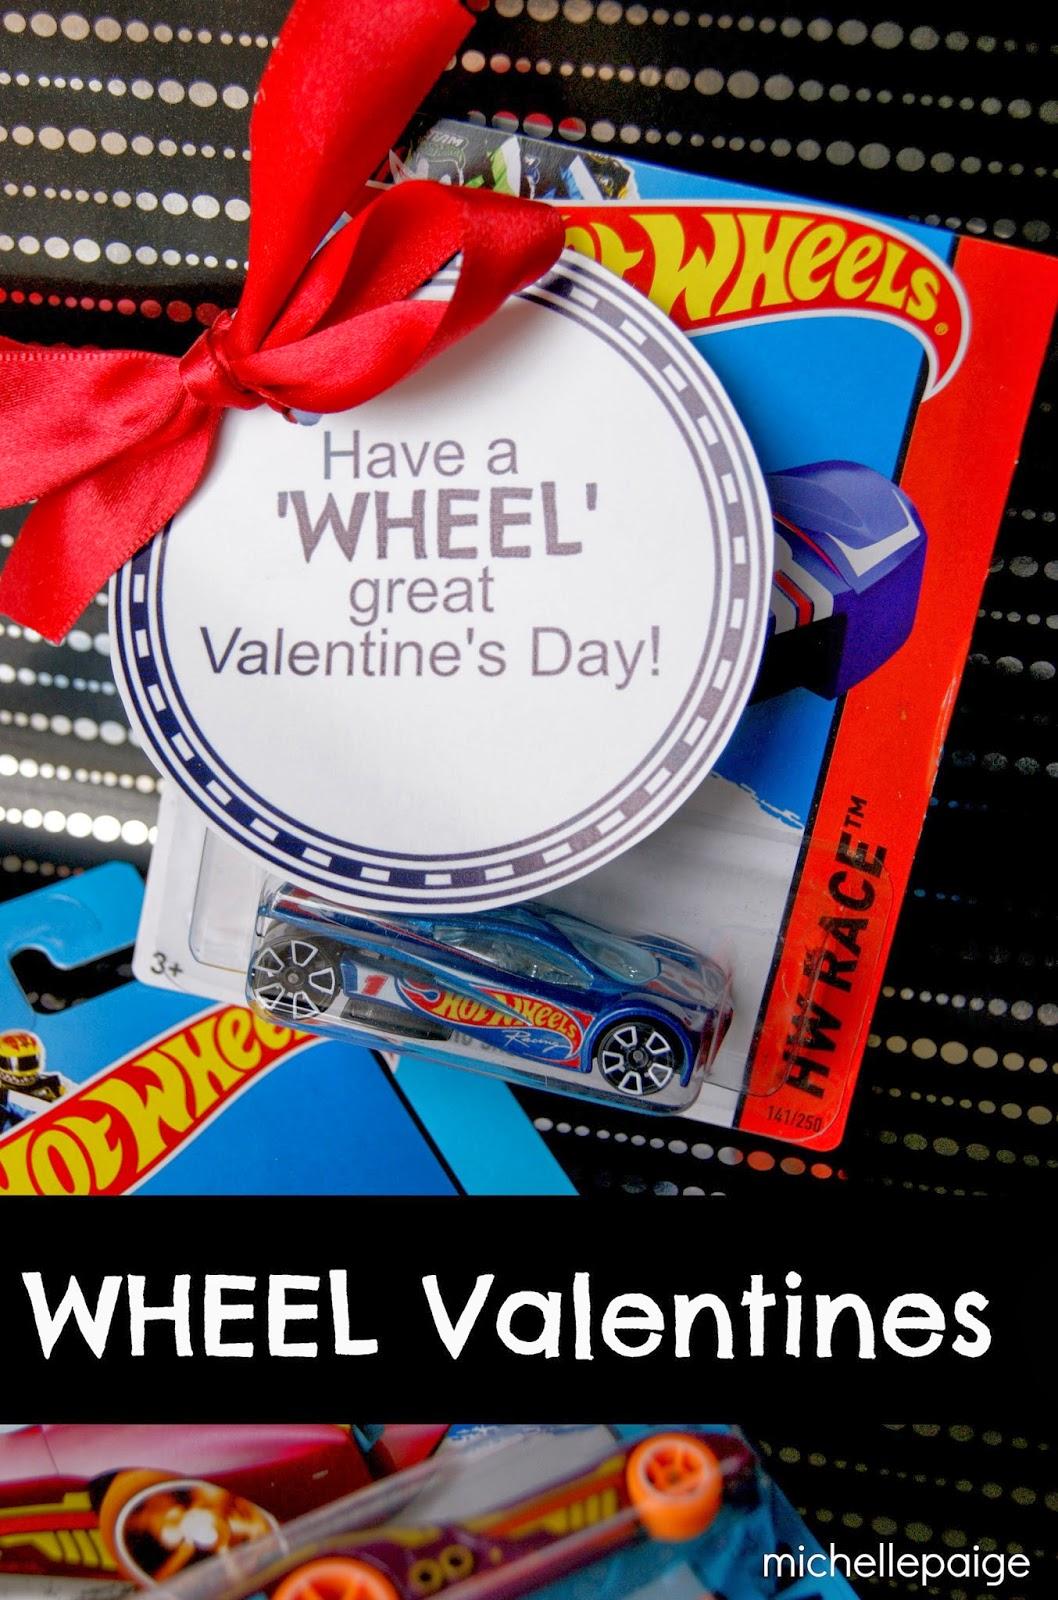 Michelle Paige Blogs Wheel Valentines